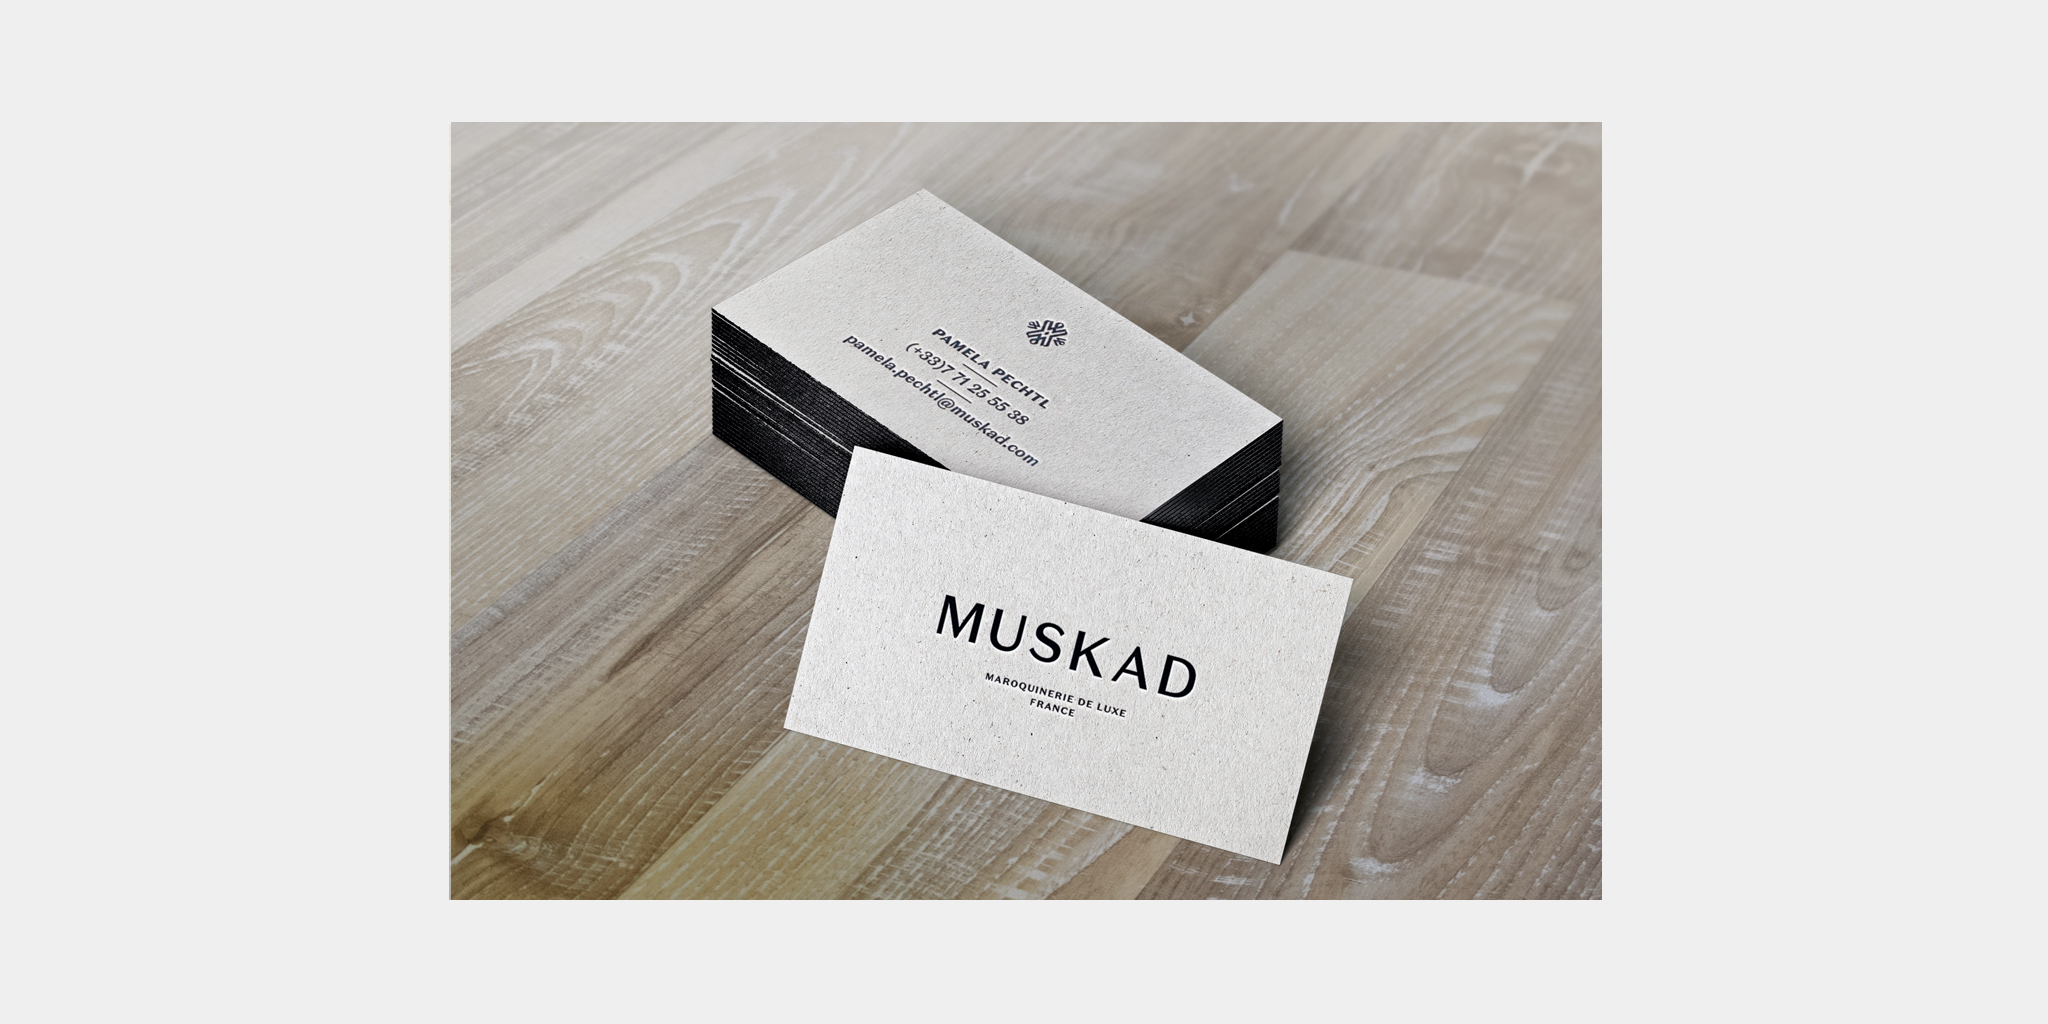 MUSKAD_BUNDS2